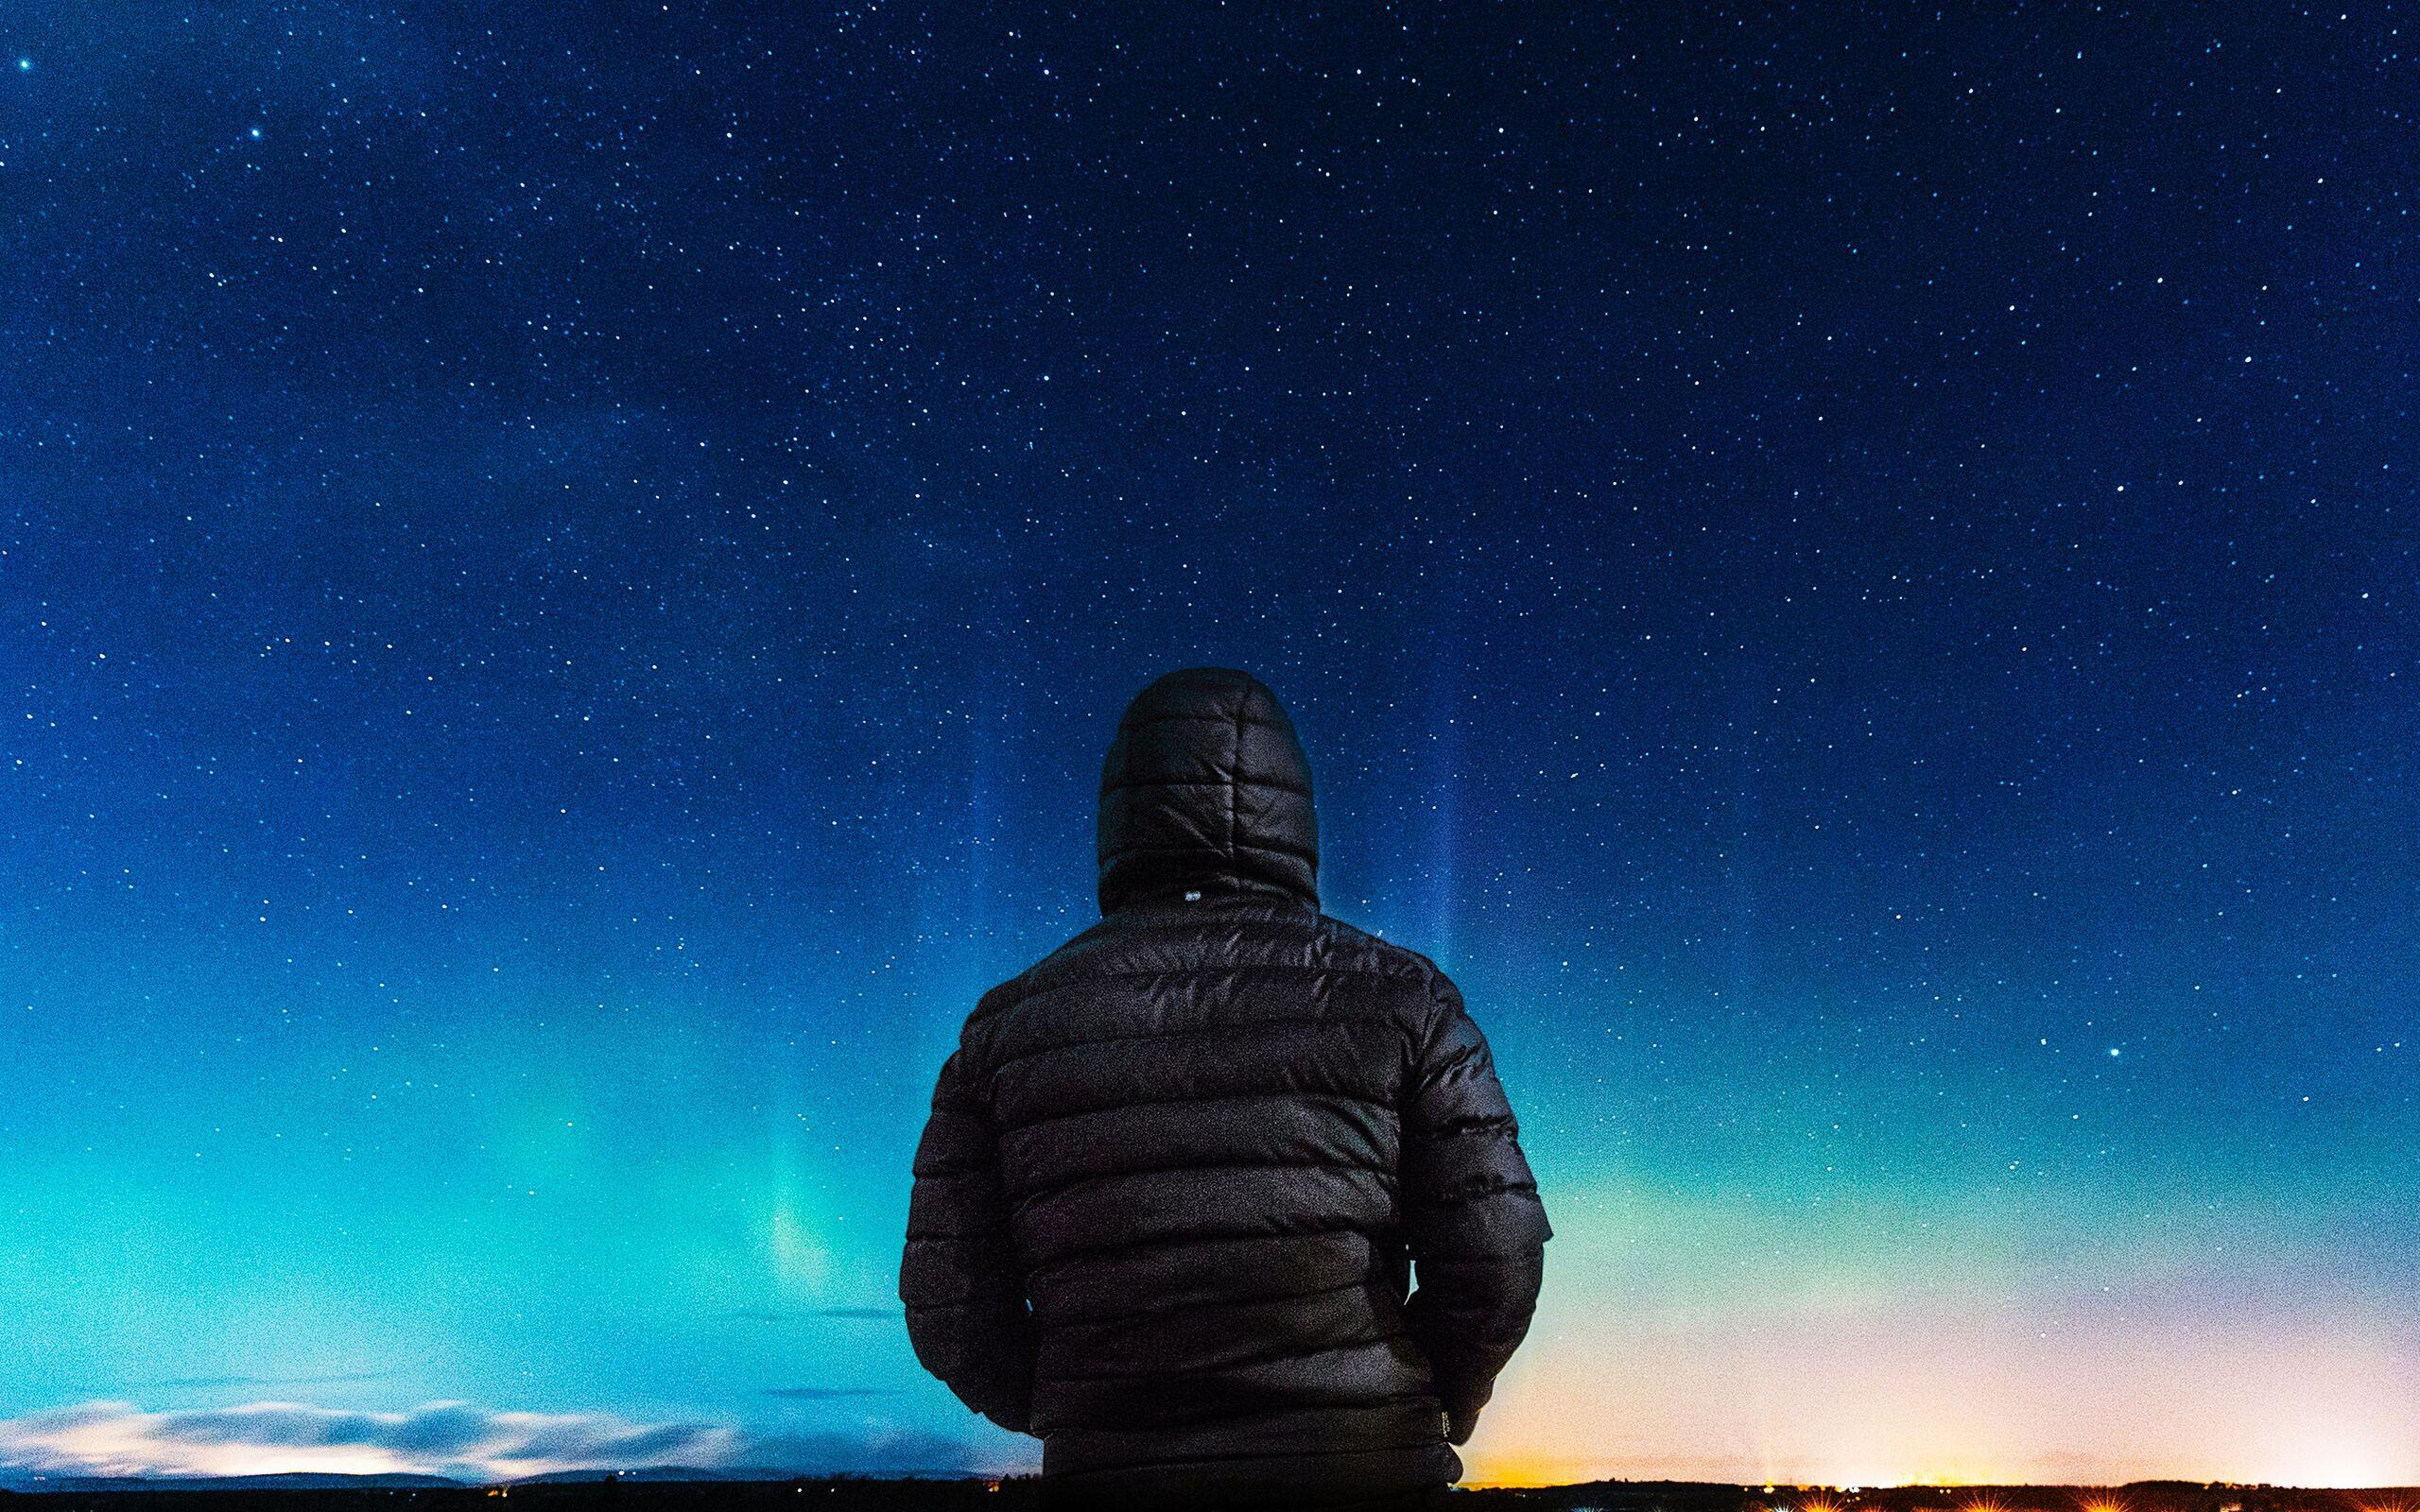 2560x1600 Alone Boy In Hoodie Looking Towards Colorful Sky